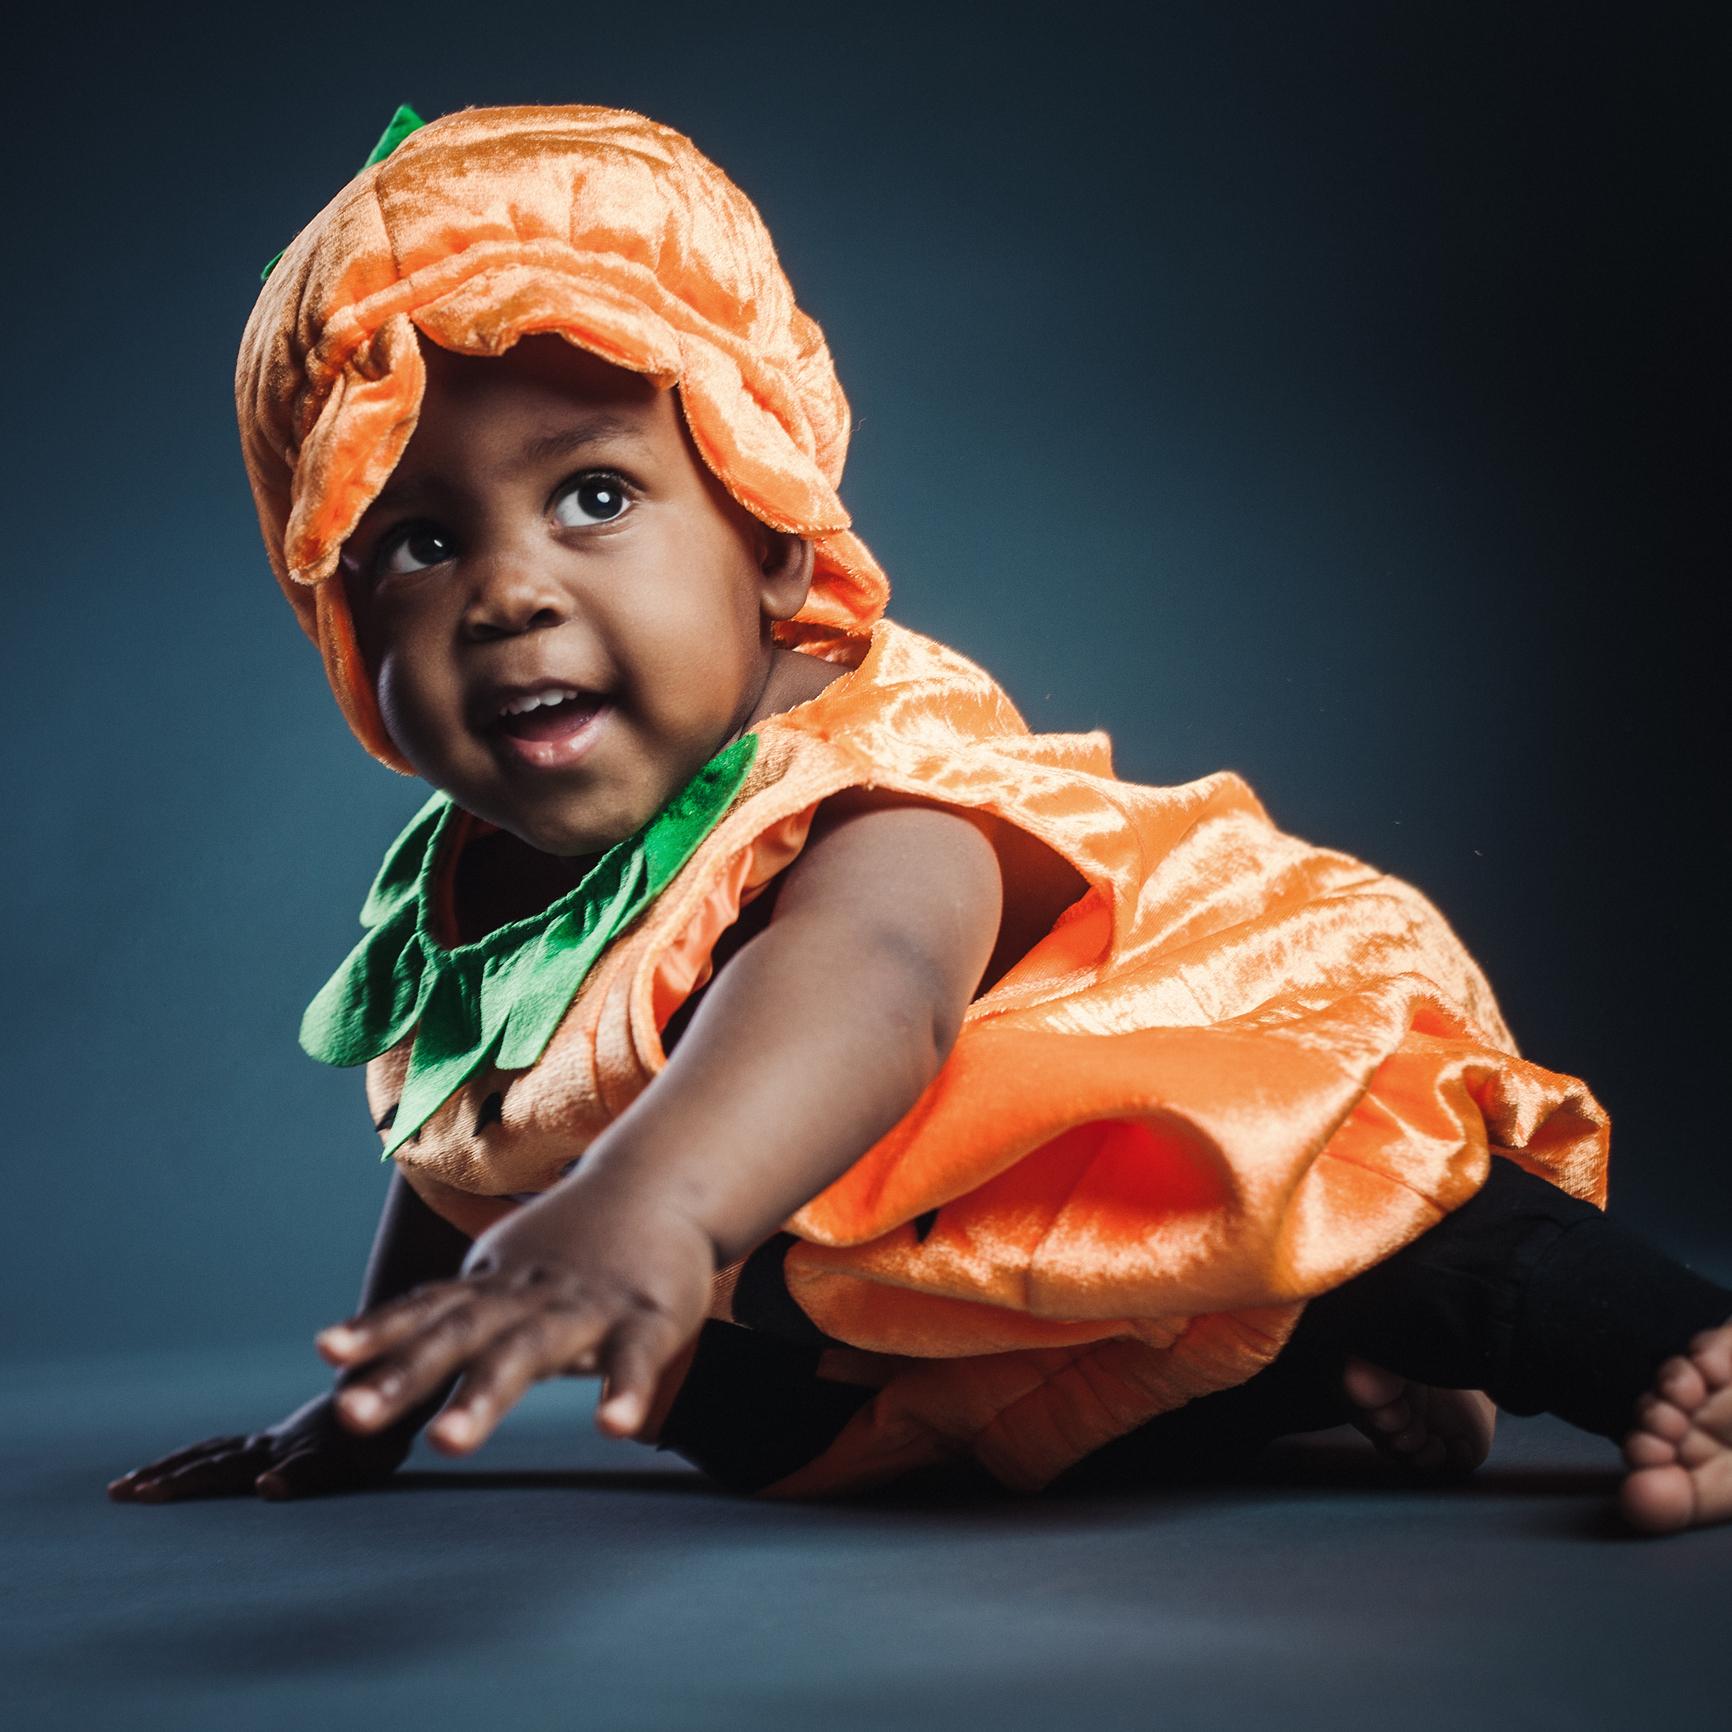 Cute baby boy in pumpkin costume